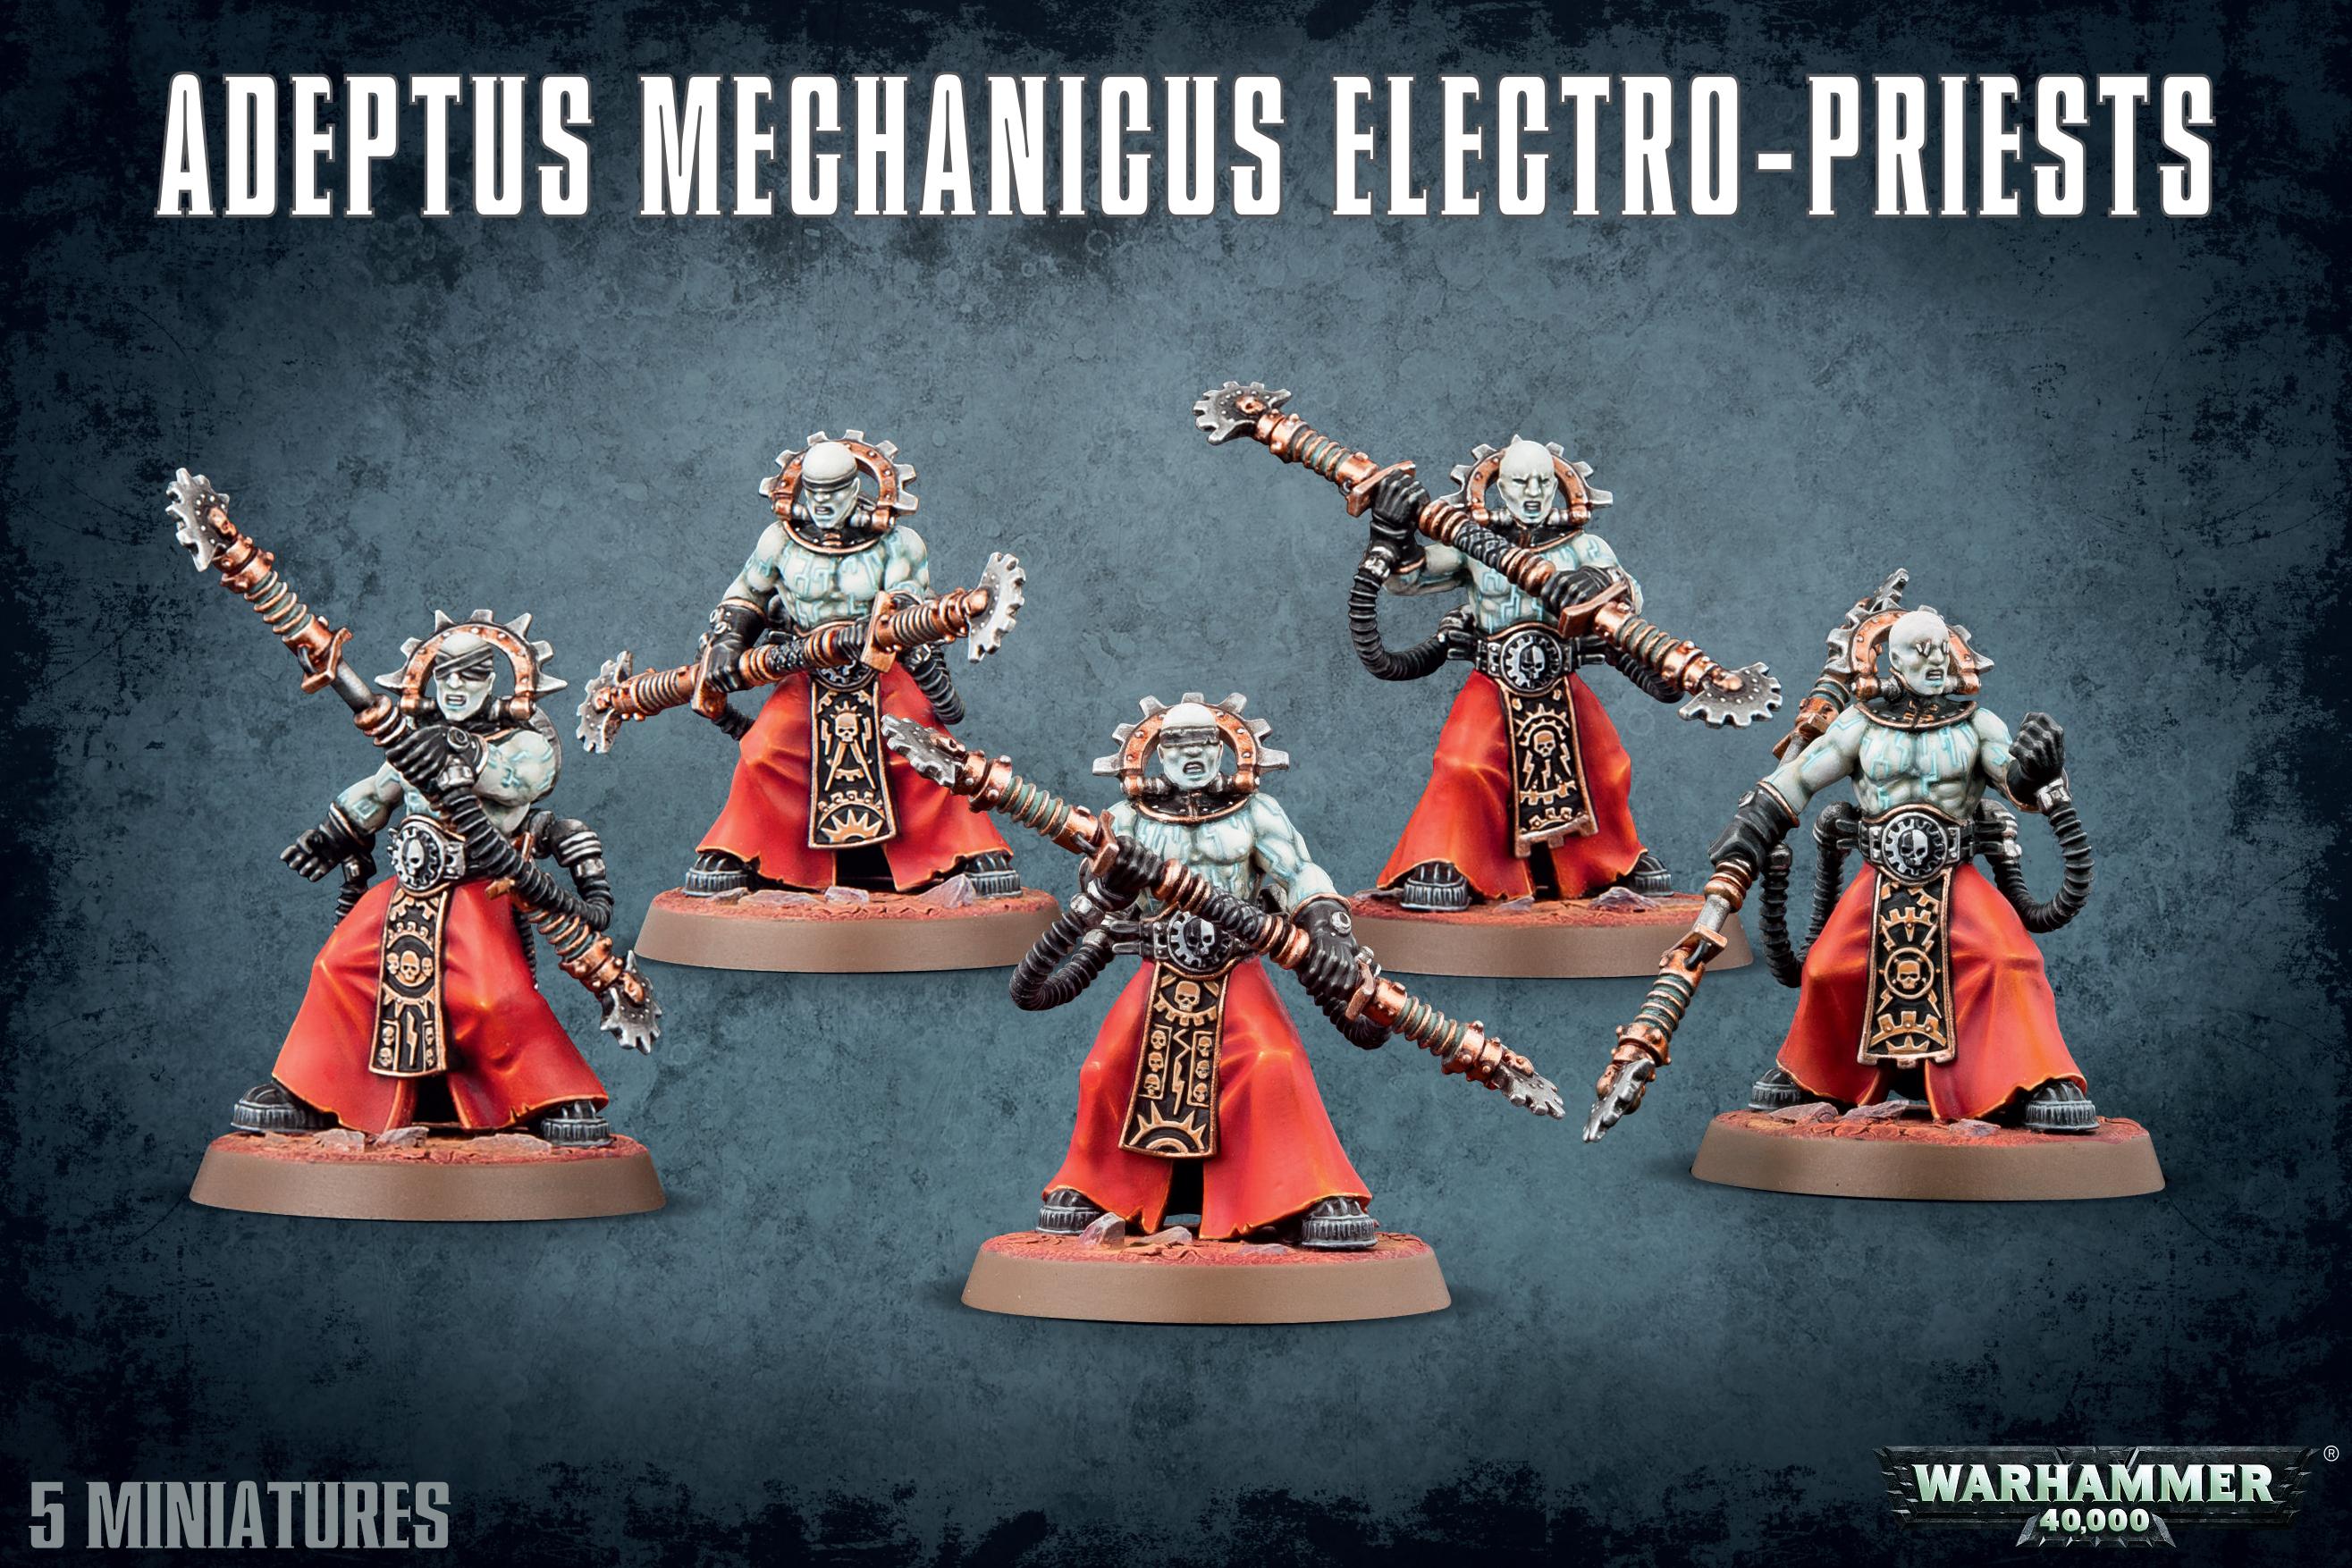 Electro-Priests